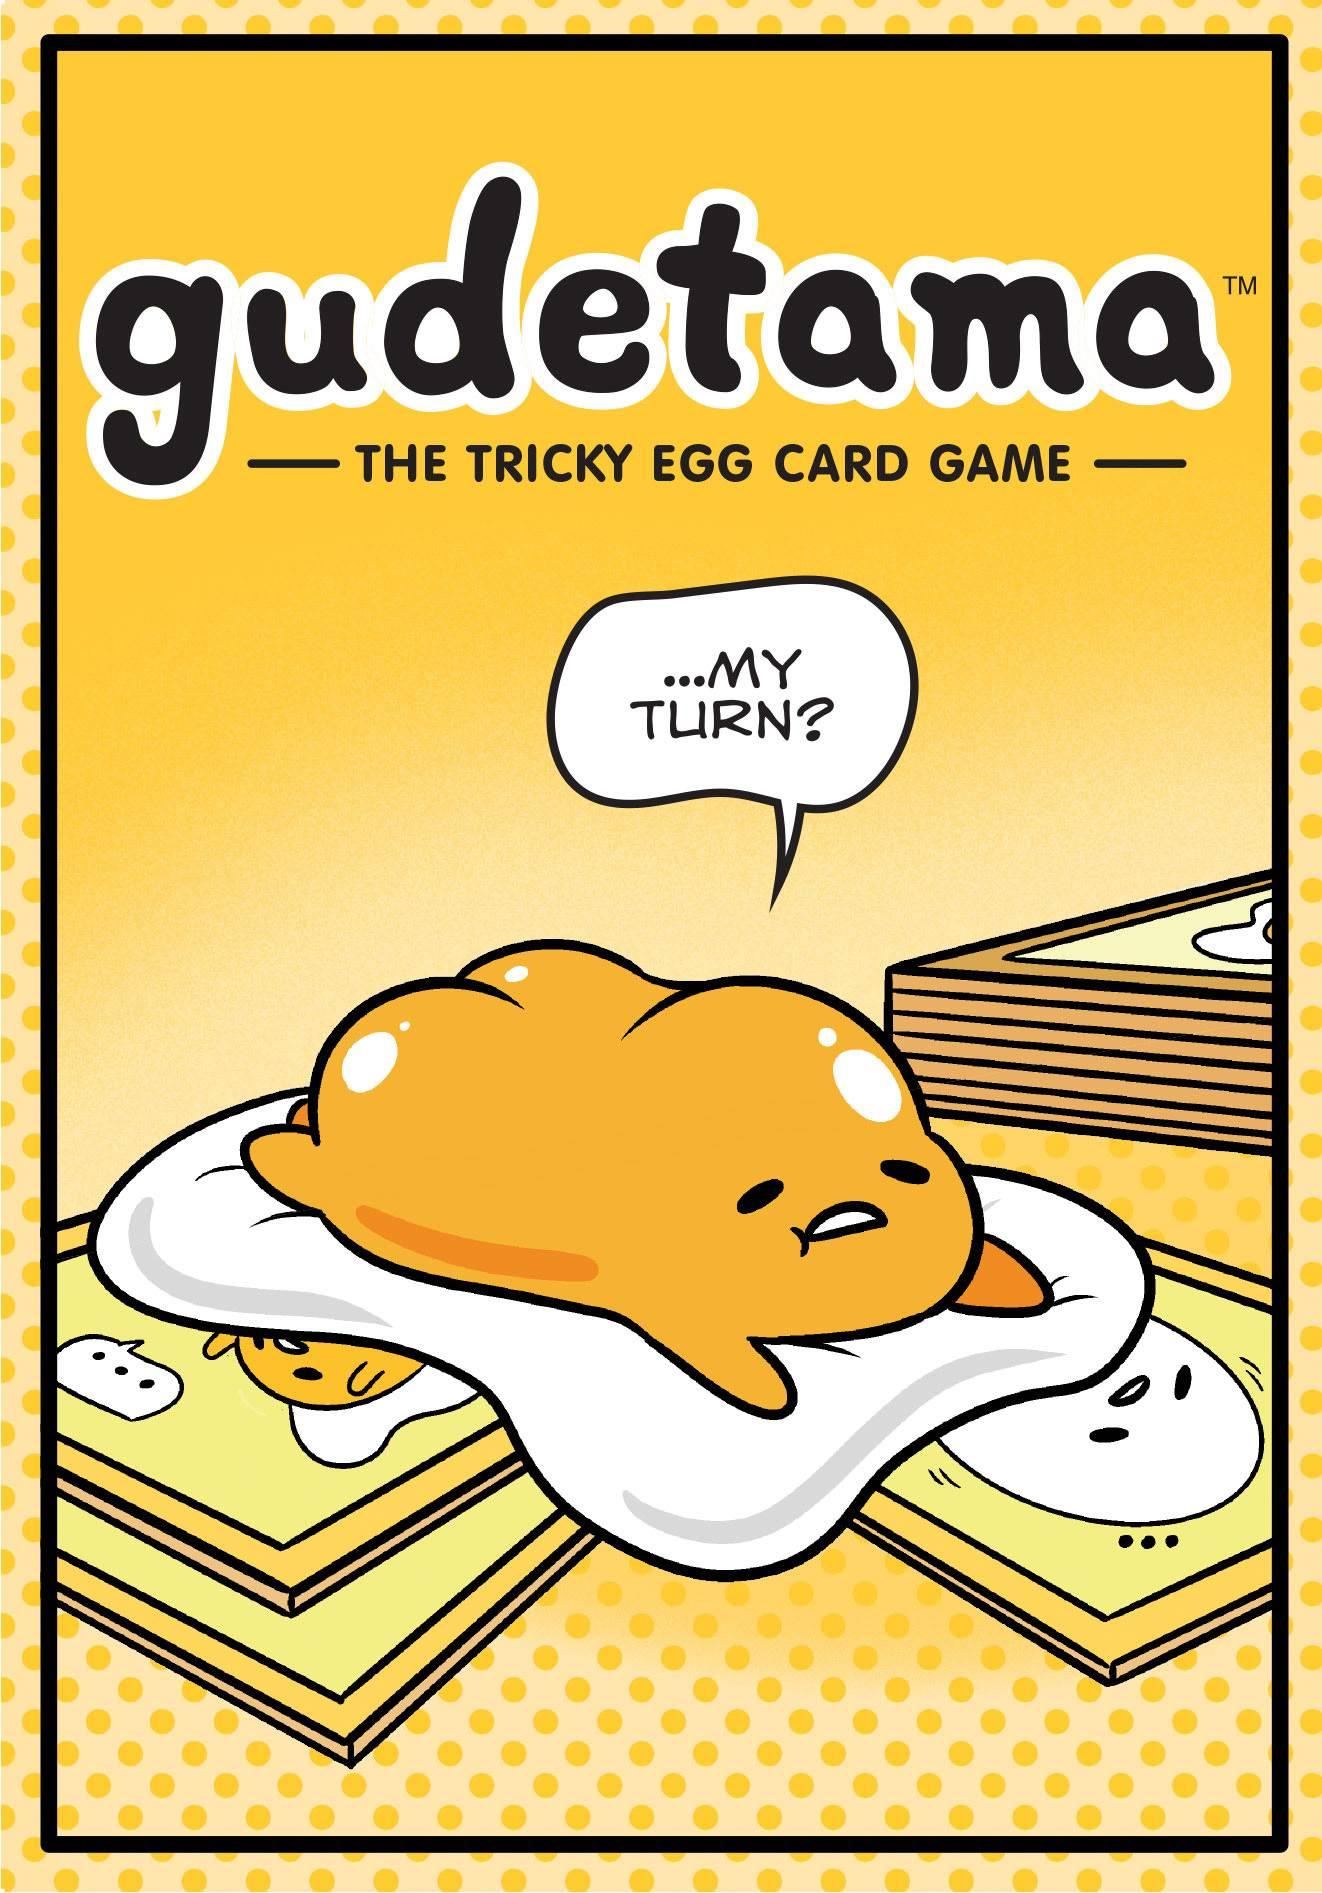 GUDETAMA TRICKY EGG CARD G AME